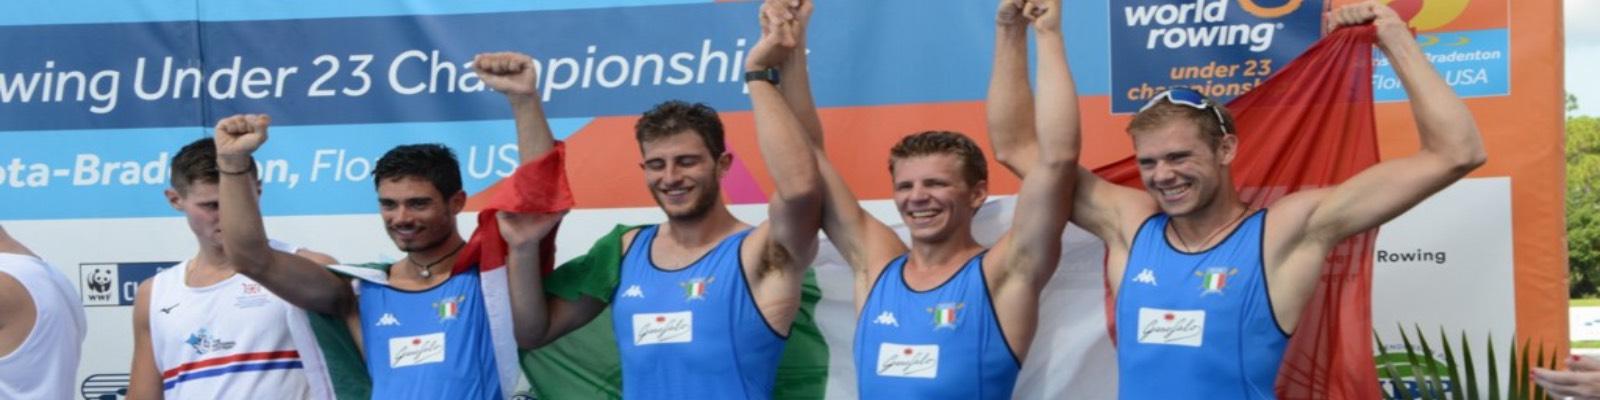 Pasta Garofalo is the pasta of rowing champions